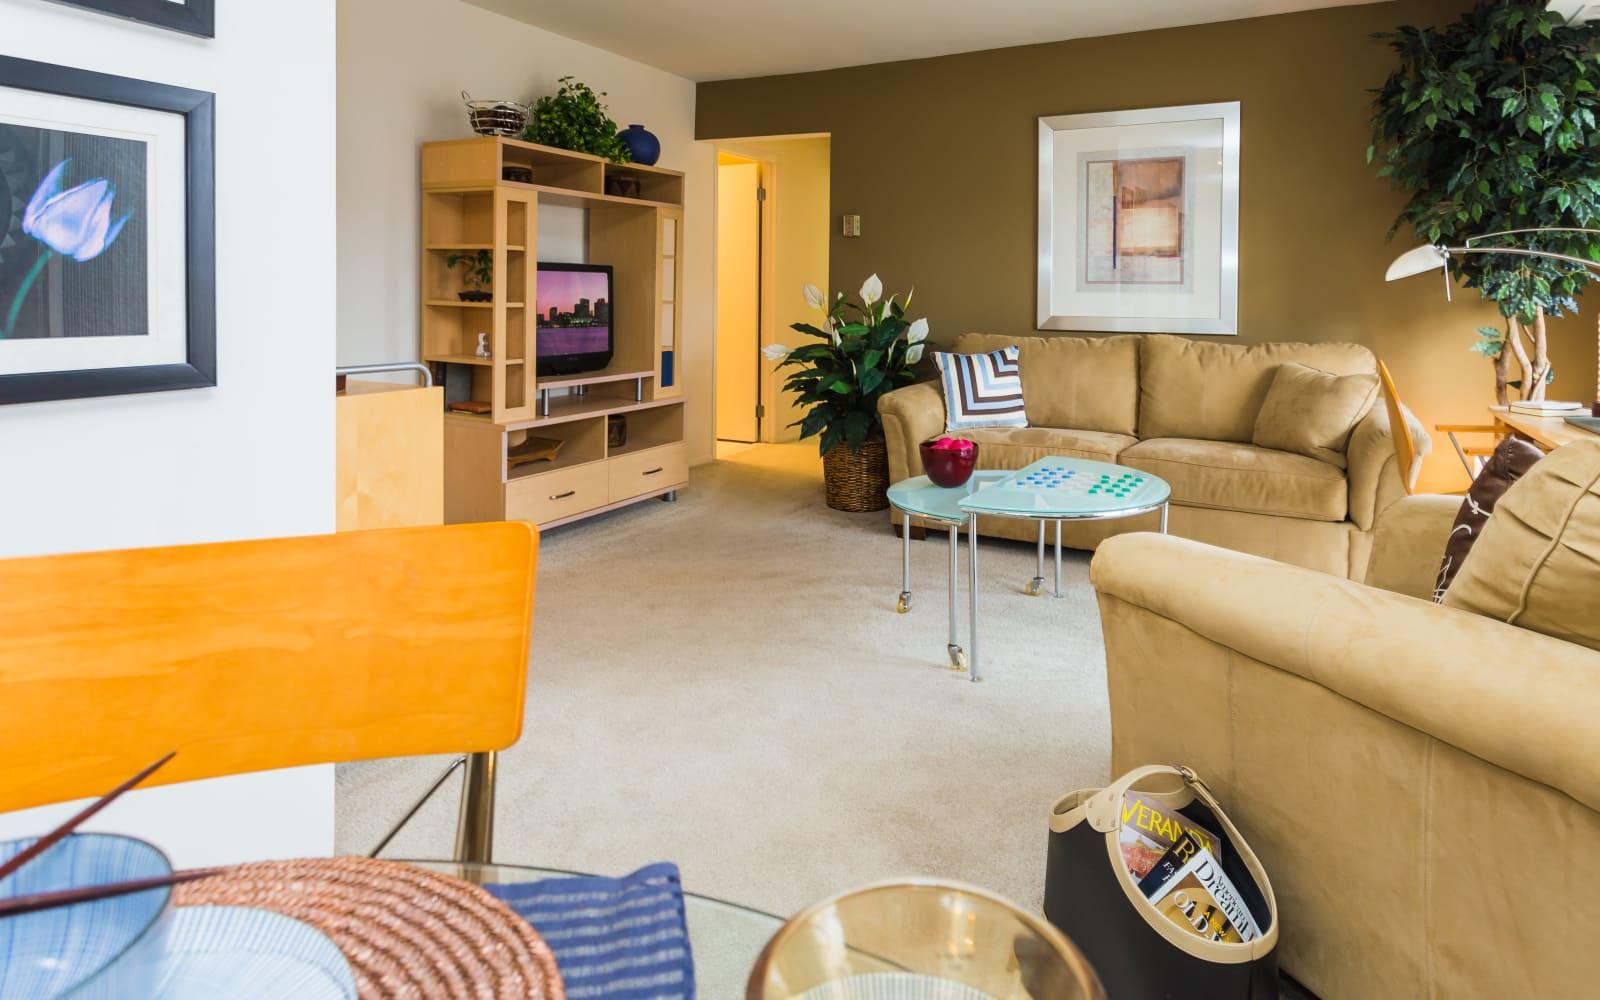 Living room area at Fairmont Park Apartments in Farmington Hills, Michigan